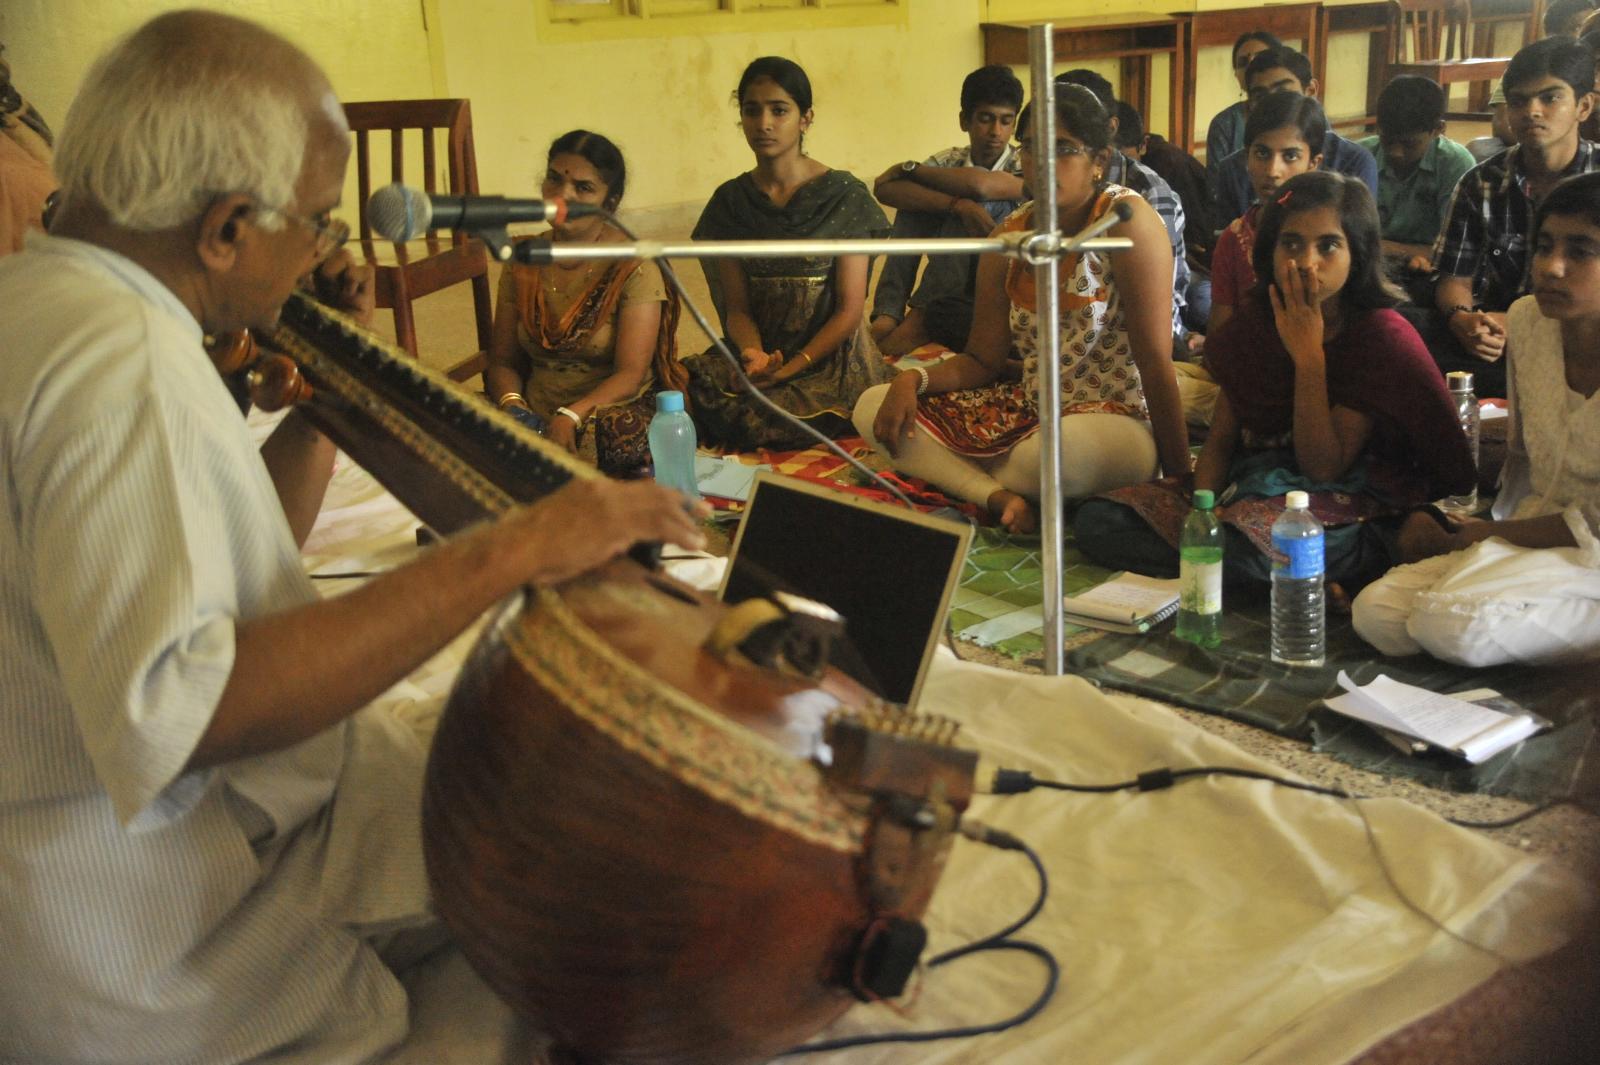 The Mac way : Septuagenarian   Veena Subramanyam at his best